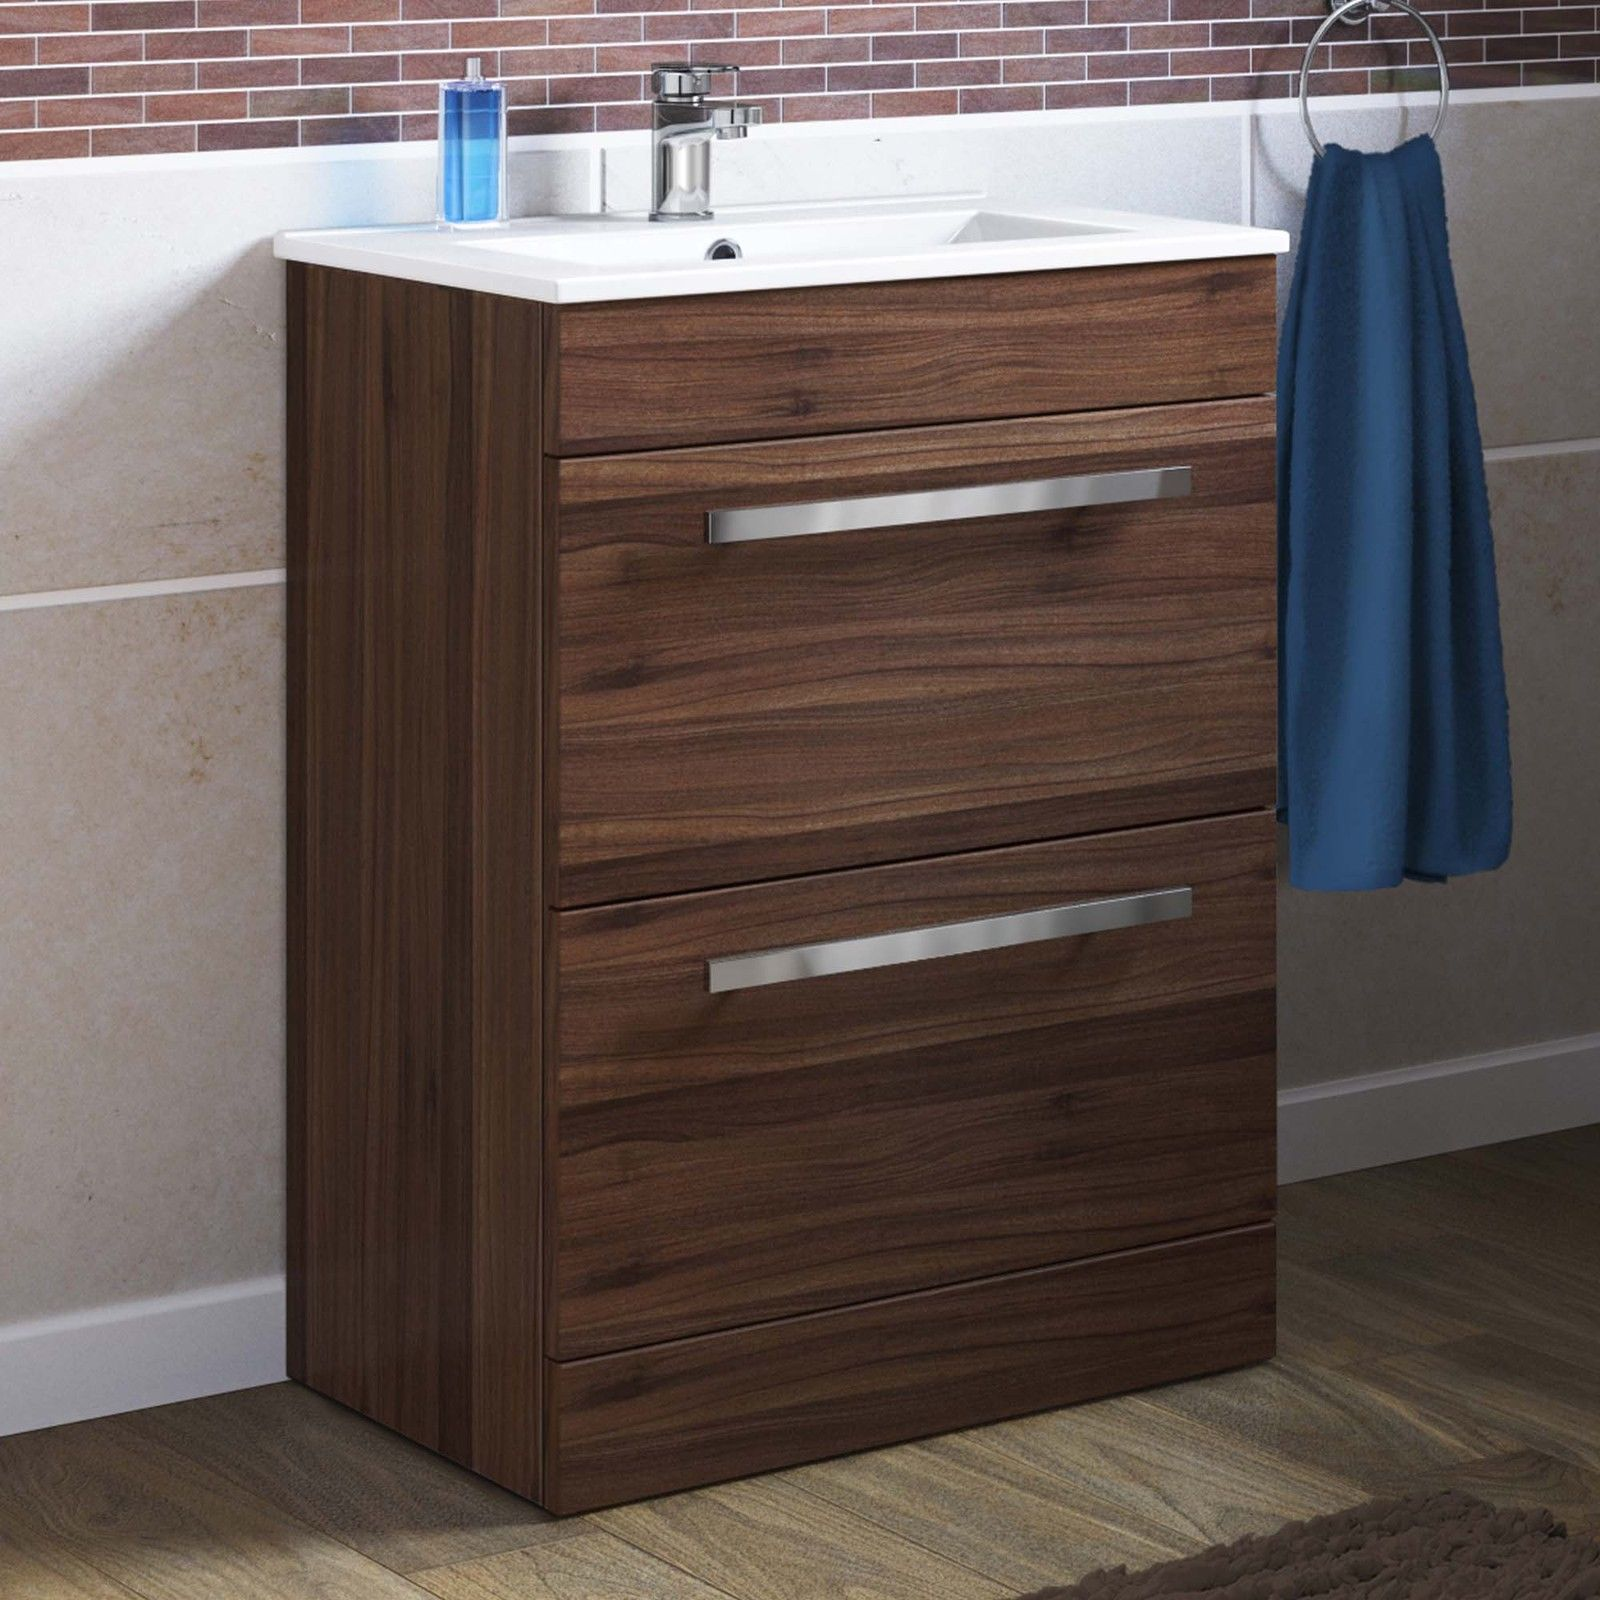 Details about modern bathroom walnut drawer storage cabinet u basin